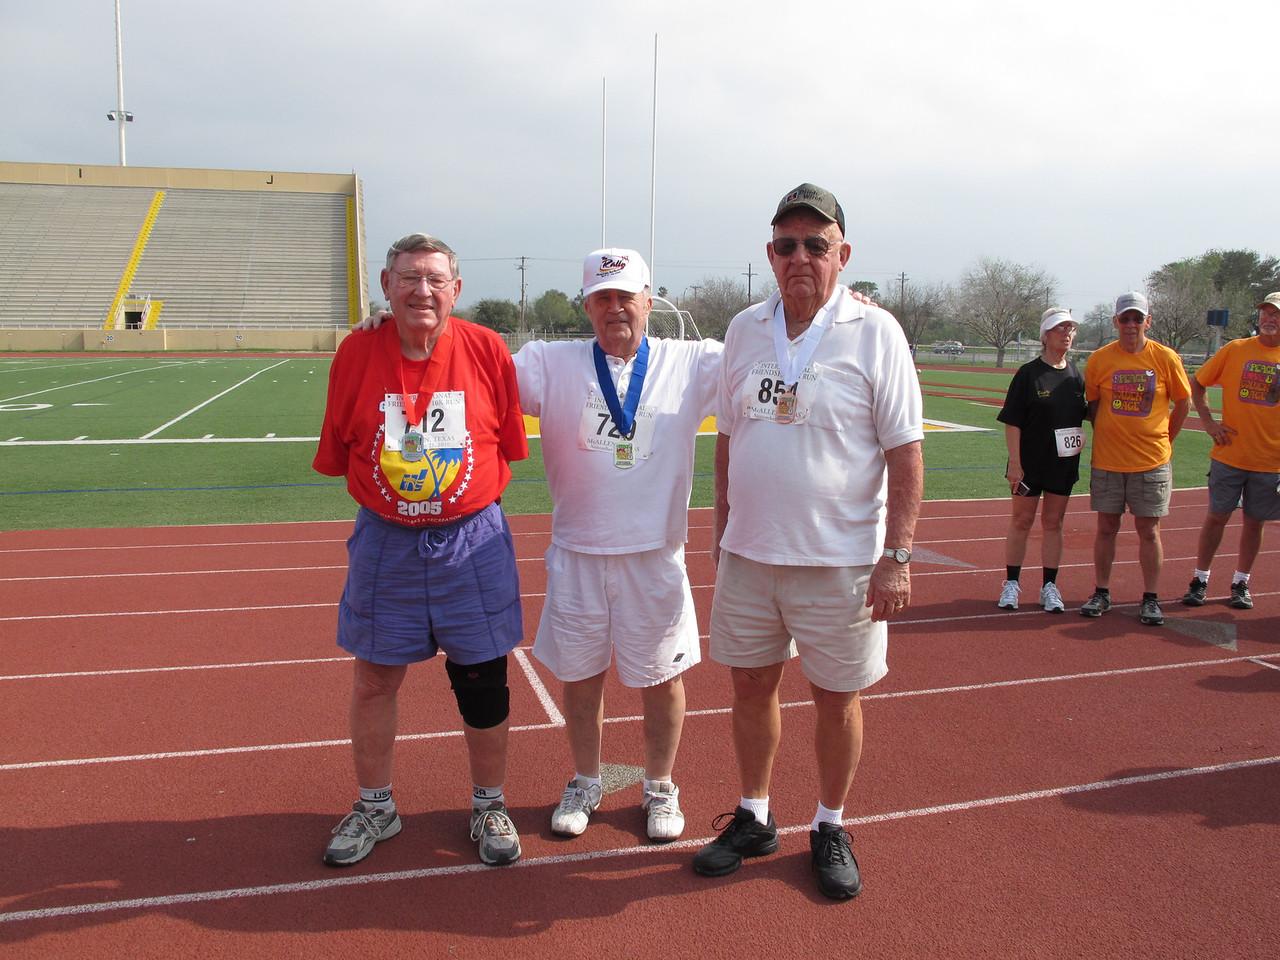 Racewalk Men 80+ (L-R) 2nd Place - Richard Hunt (Texan Mobile), 1st Place - Robert Brinton (Tropic Star), 3rd Place - Jack McNutt (Bit O Heaven)